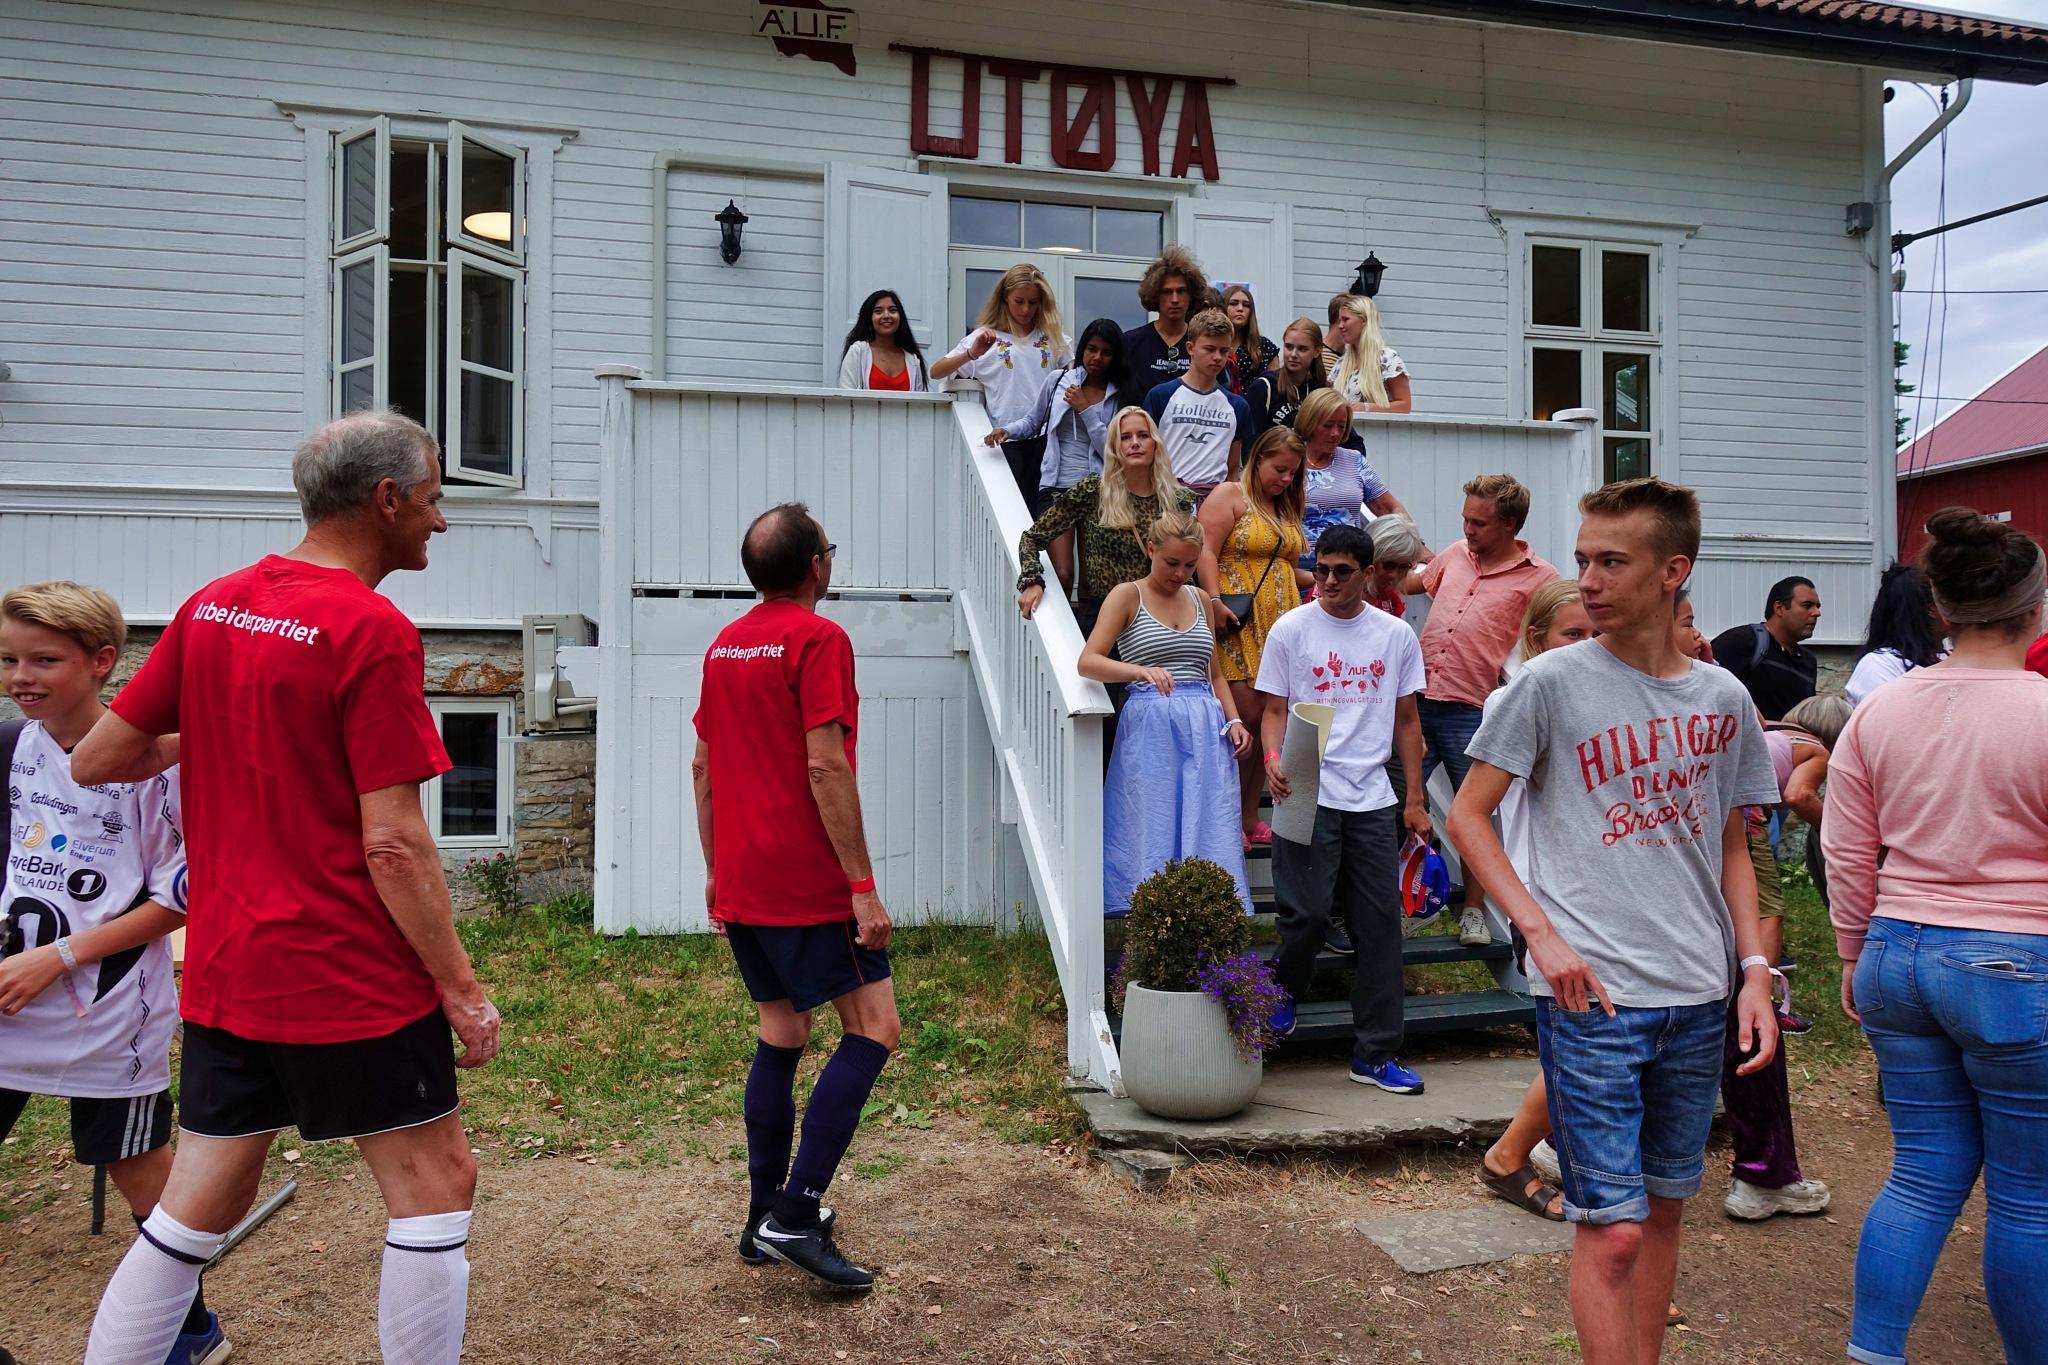 Utøya island- 7 years later by Goran Jorganovich